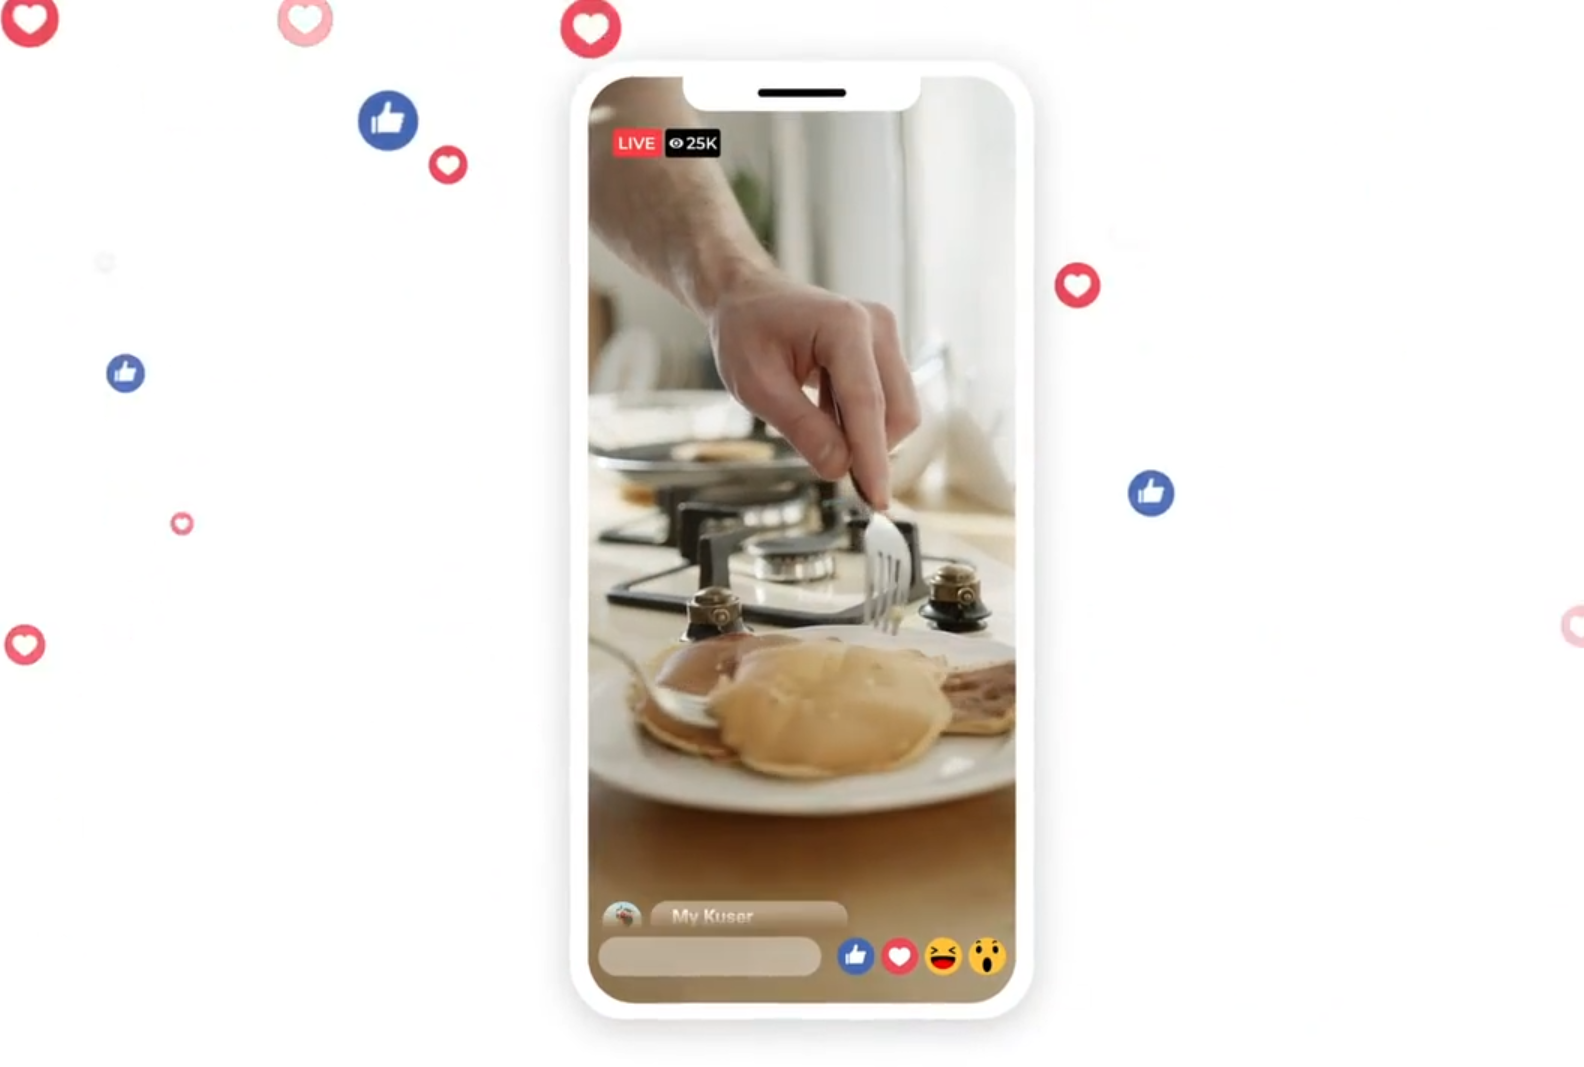 Premiere模板-脸书Facebook直播点赞视频包装作品宣传视频模板